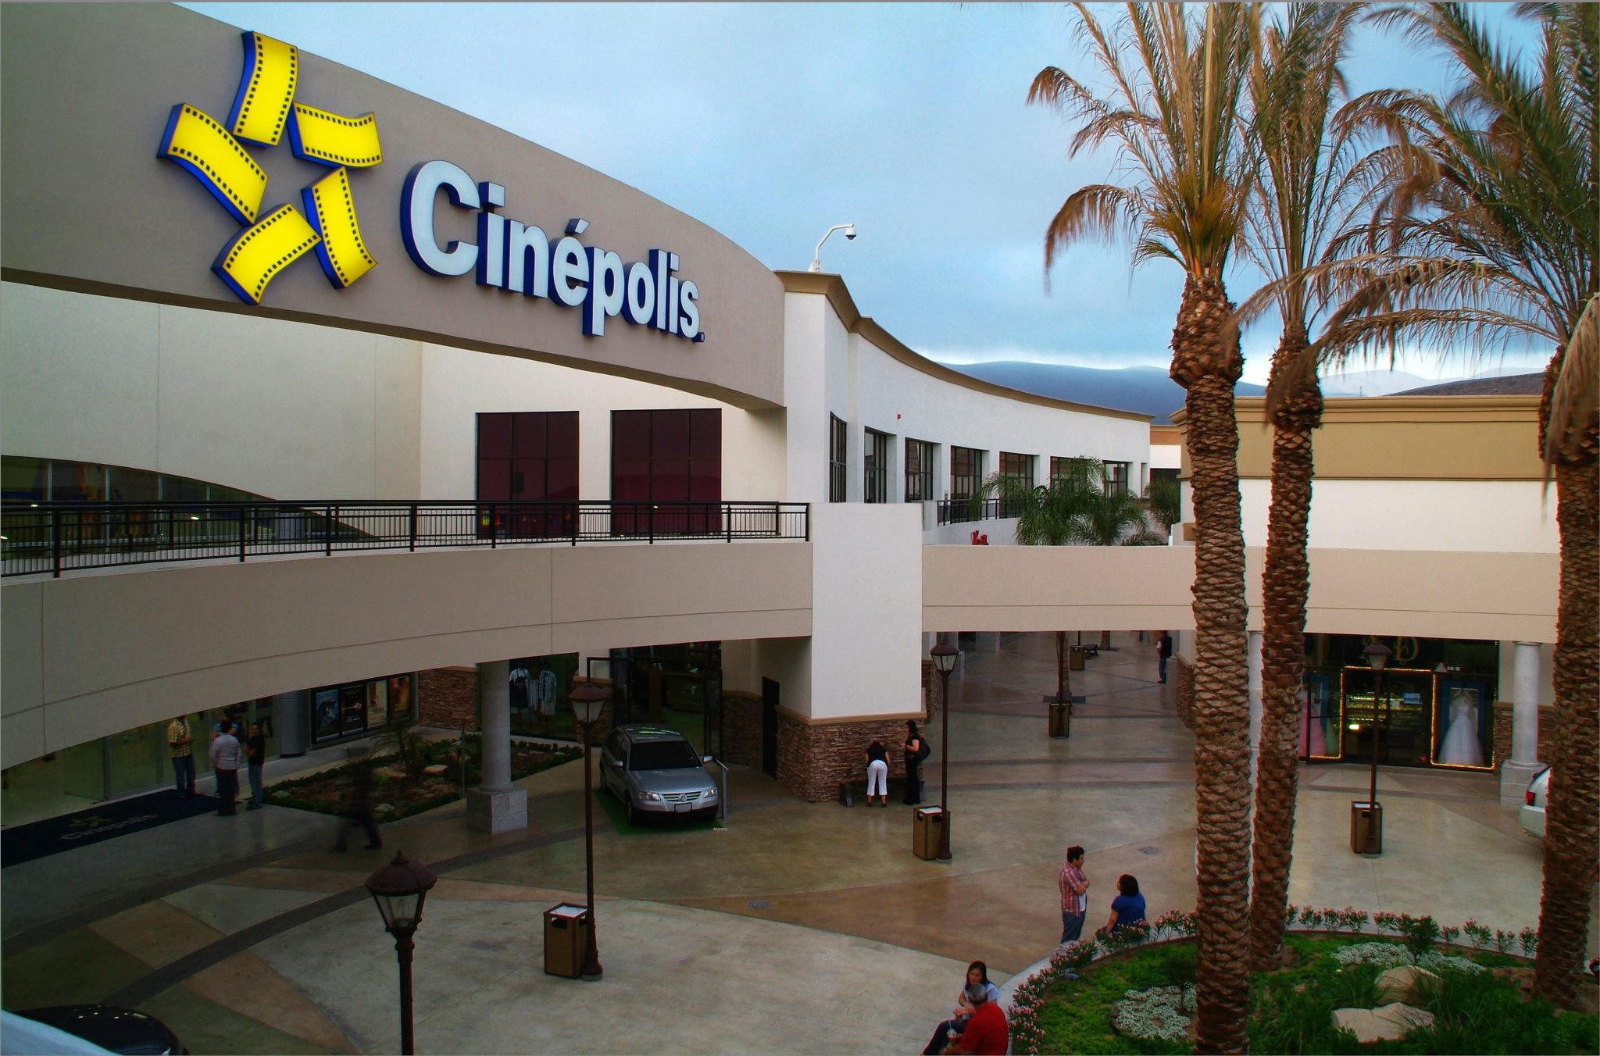 Plaza del Mar shopping Mall with Cinepolis movie theater in Ensenada